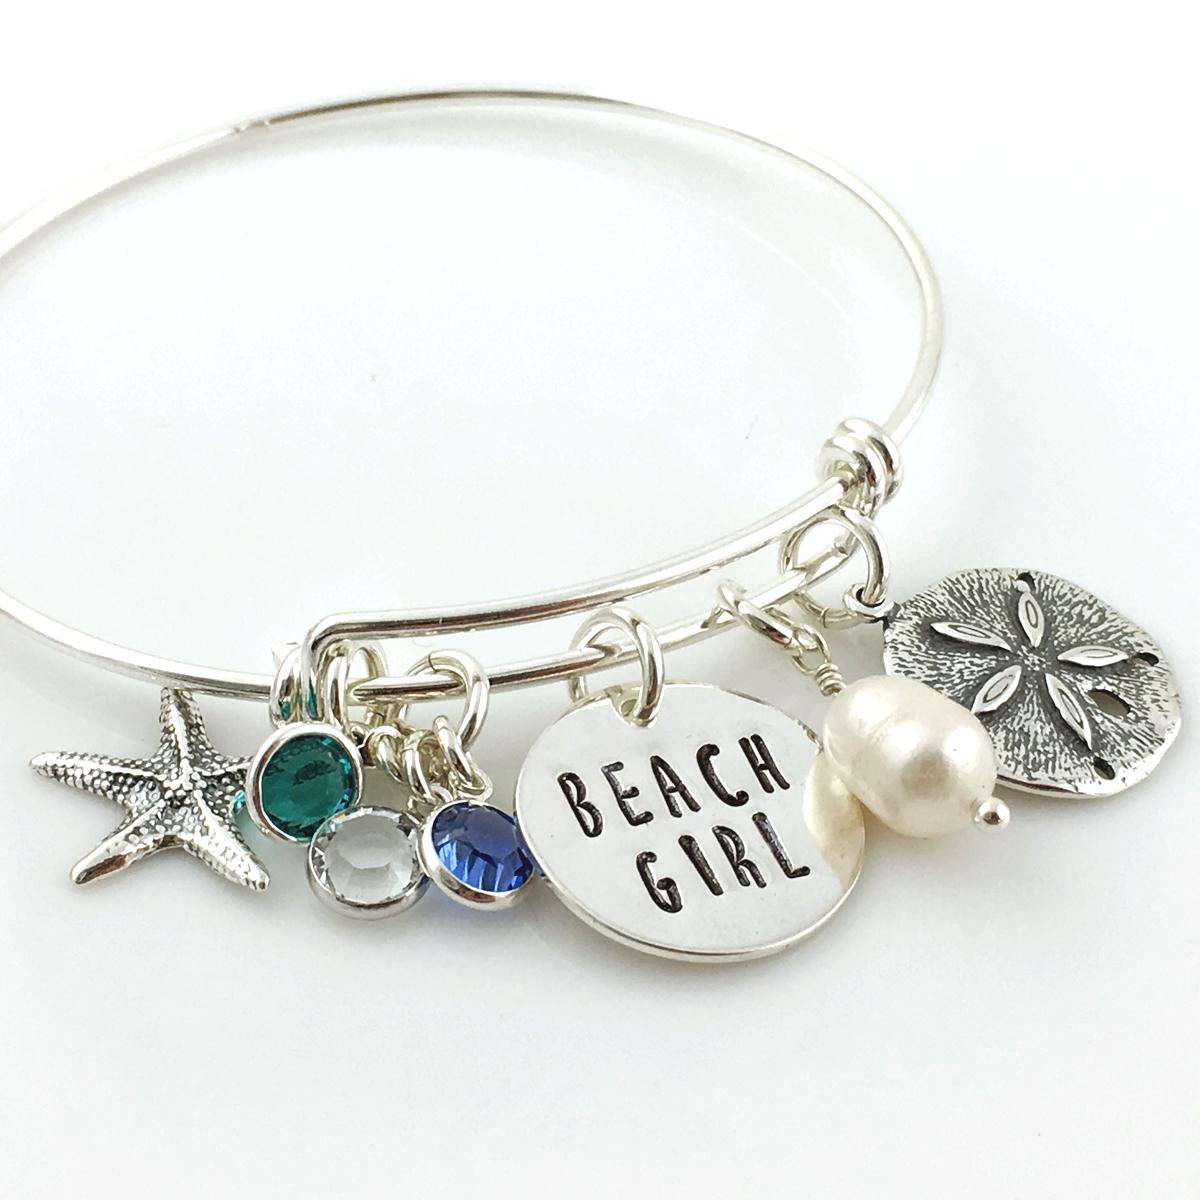 Beach Girl / Beach Life Simply Charming Bangle Bracelet